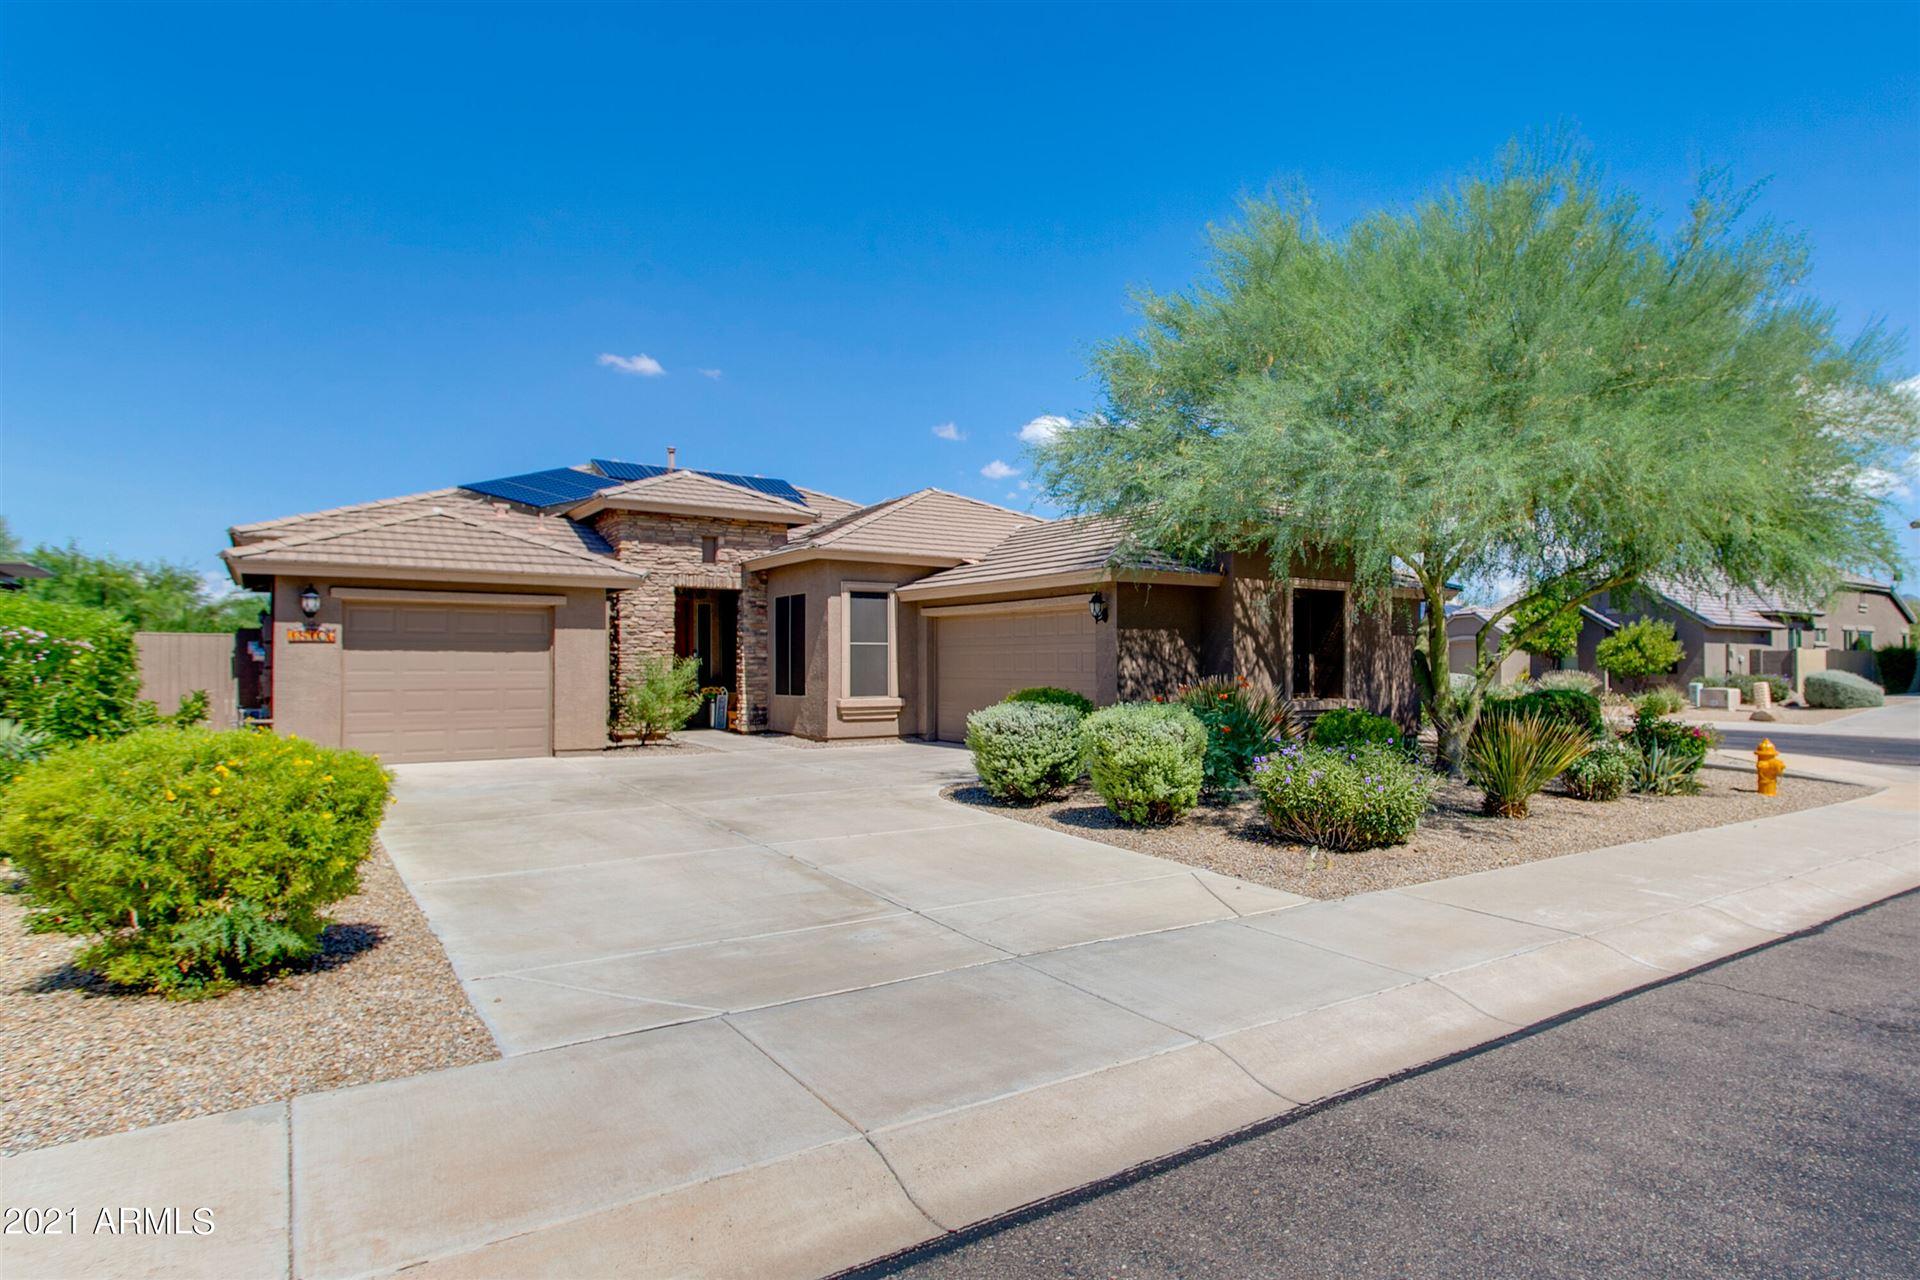 Photo of 18106 W WIND SONG Avenue, Goodyear, AZ 85338 (MLS # 6296583)